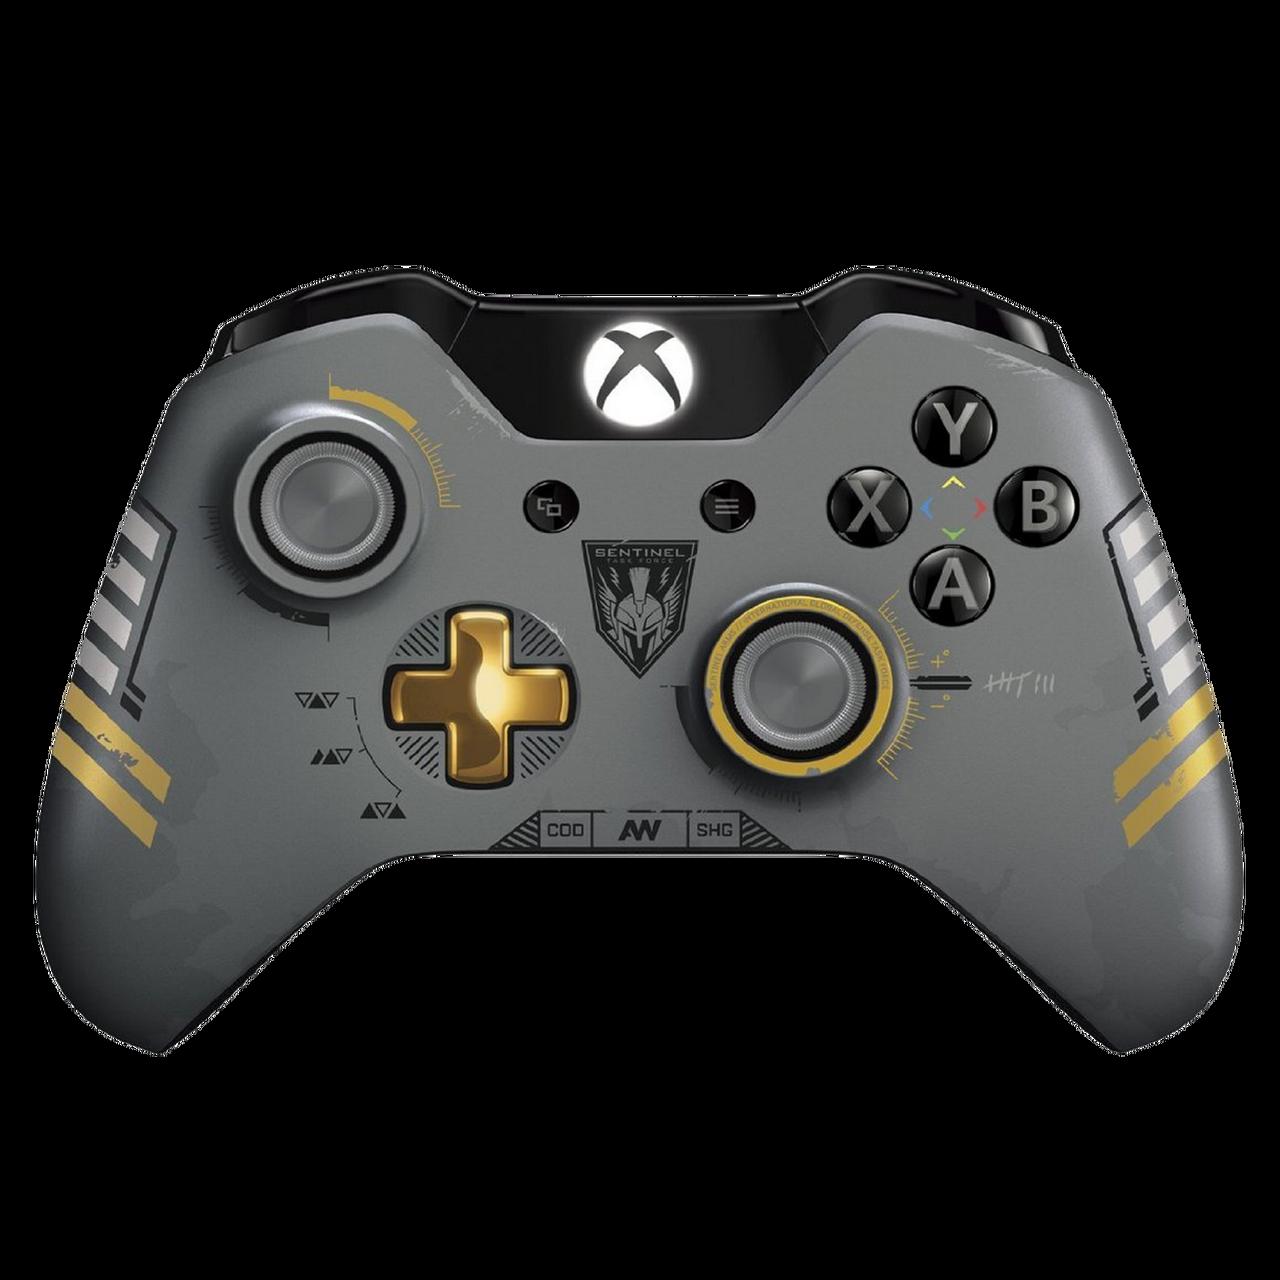 Call Of Duty Advanced Warfare Wireless Xbox One Controller Xbox One Controller Xbox Accessories Call Of Duty